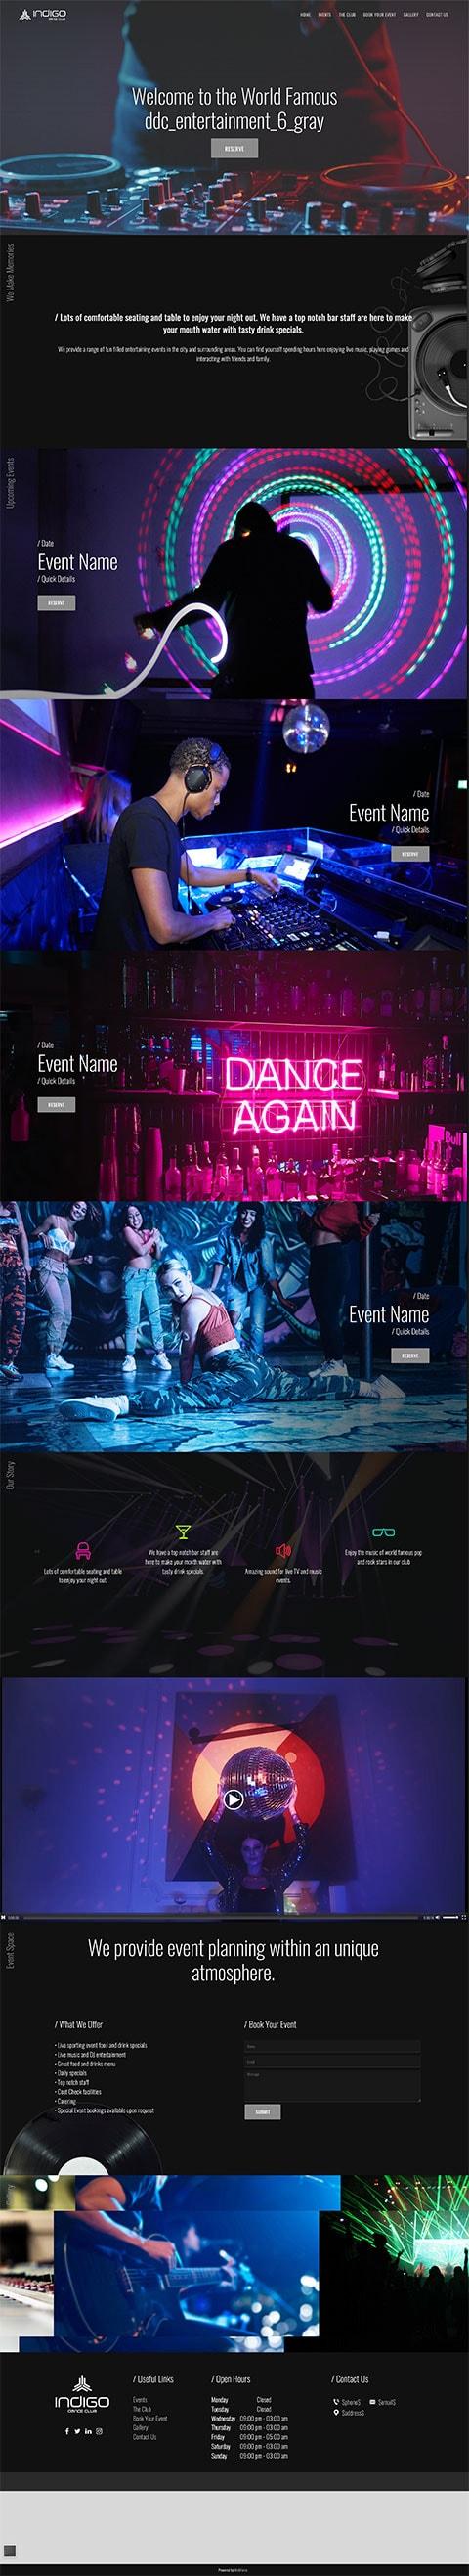 Entertainment 6